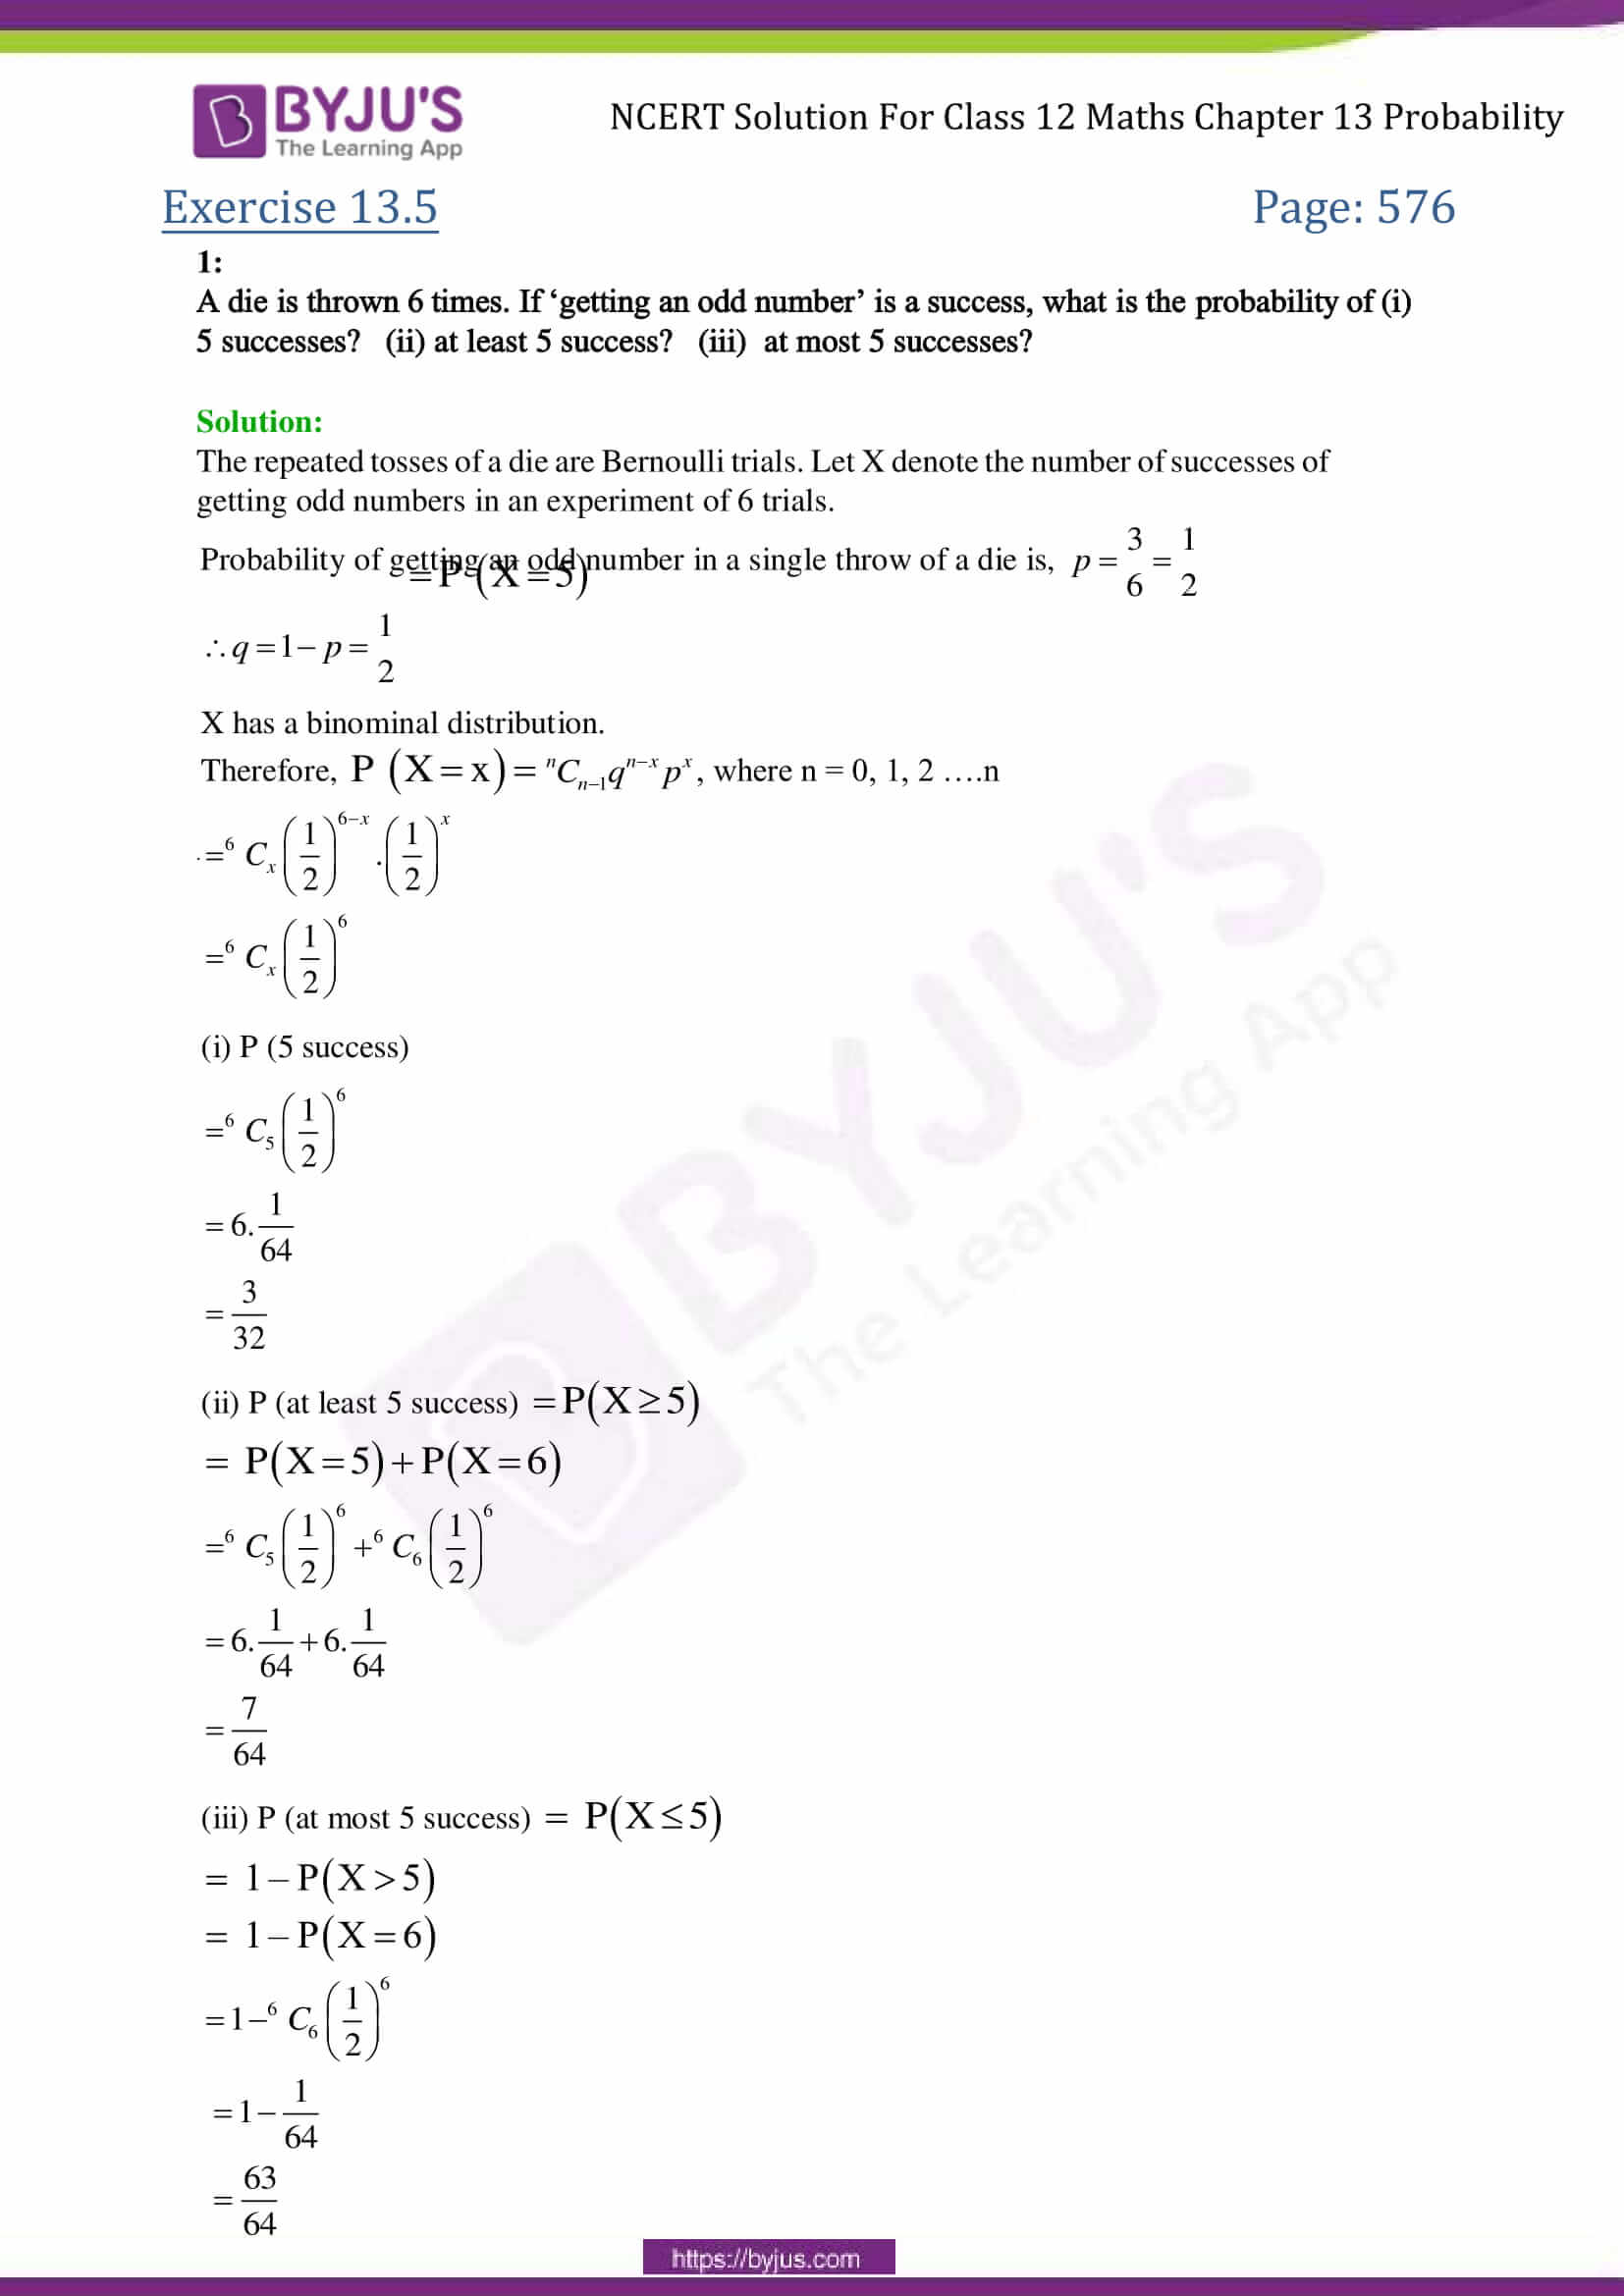 Microeconomics Class 12 Important Questions Pdf